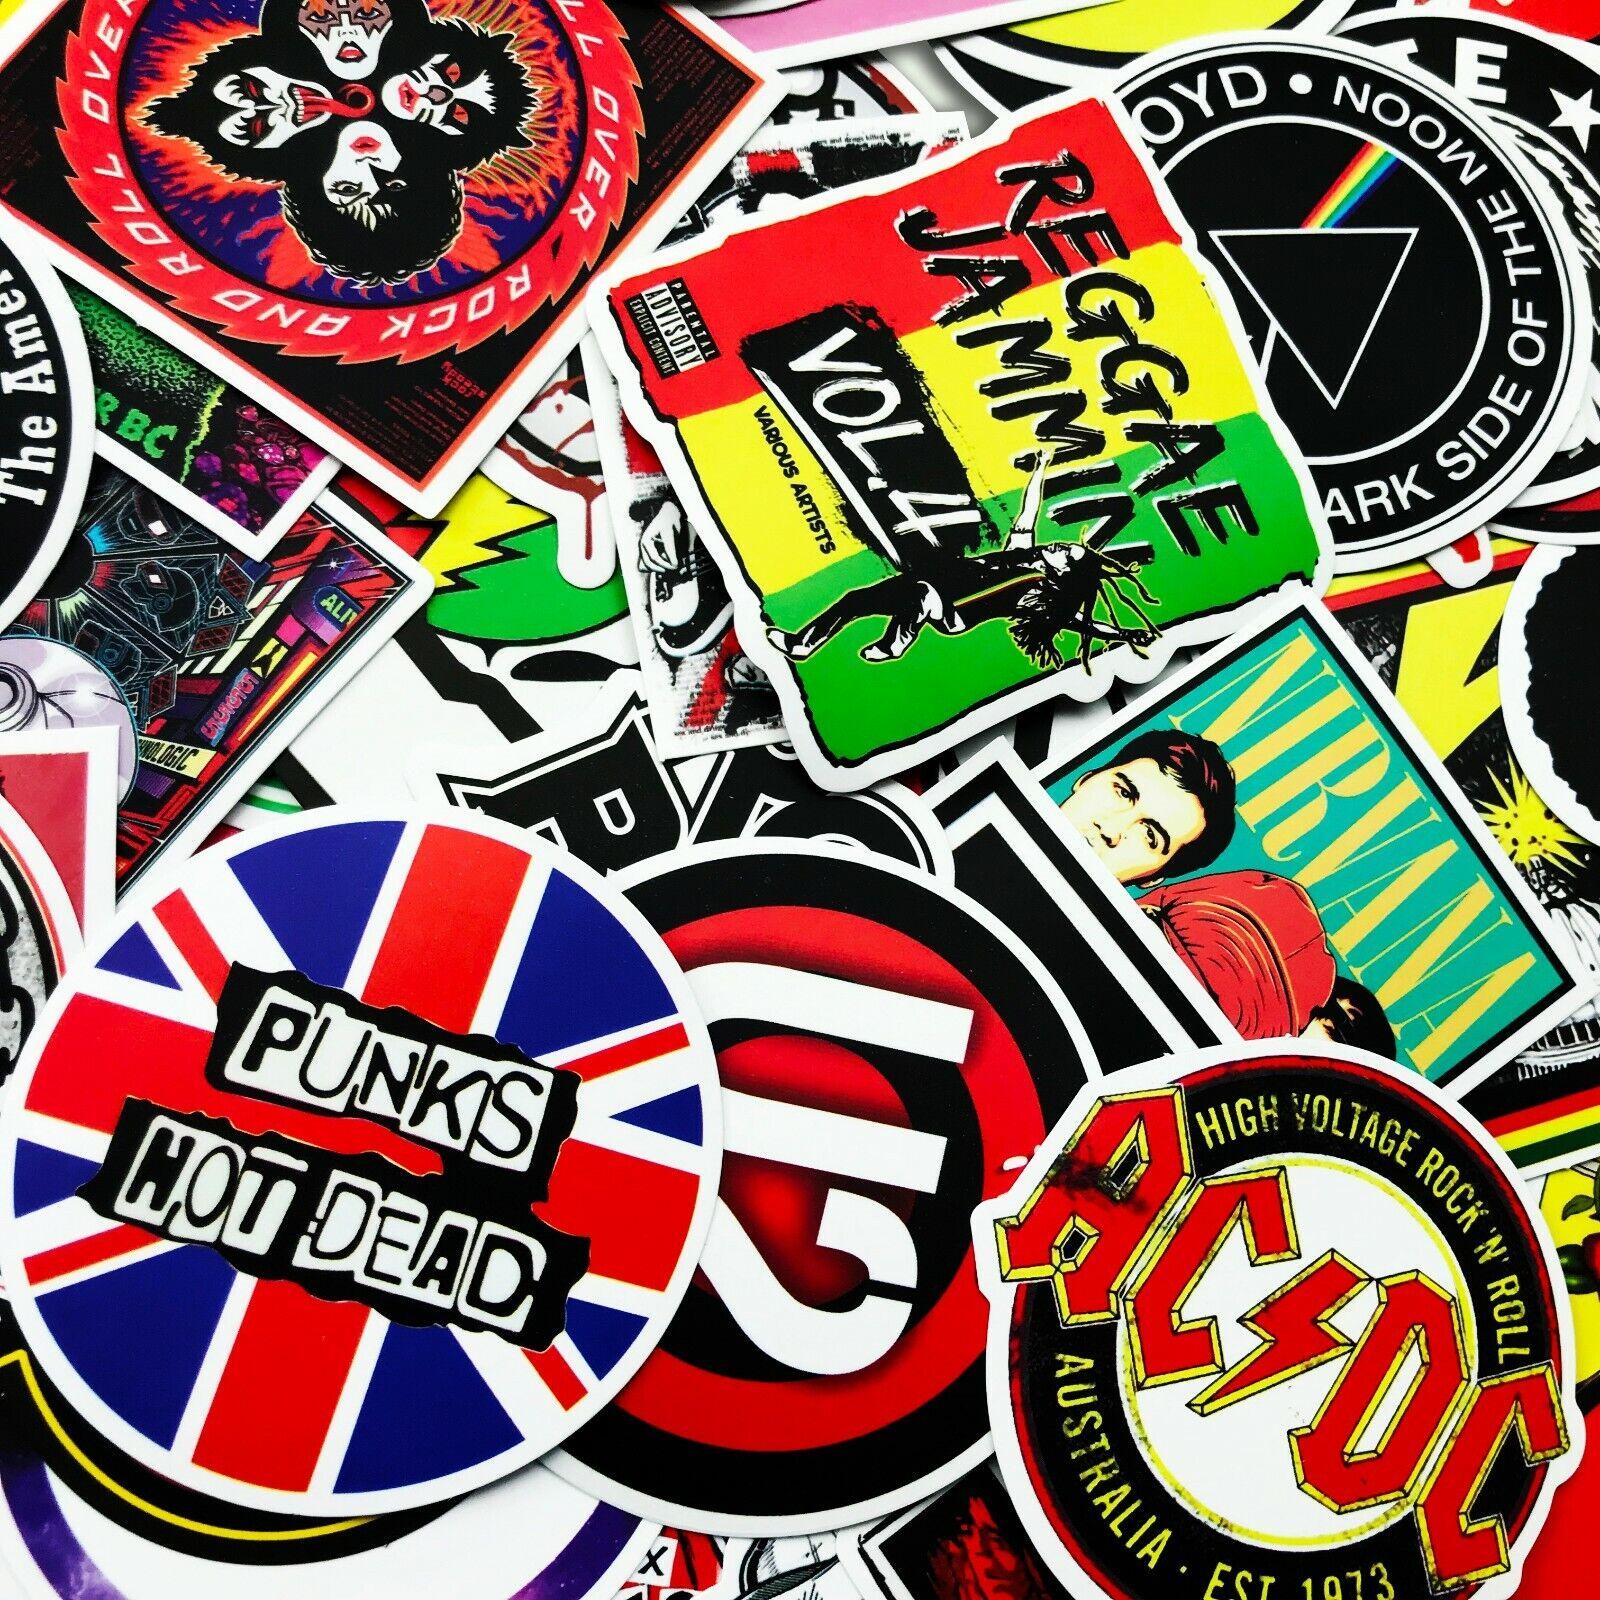 100 pcs rock band logo stickers decal